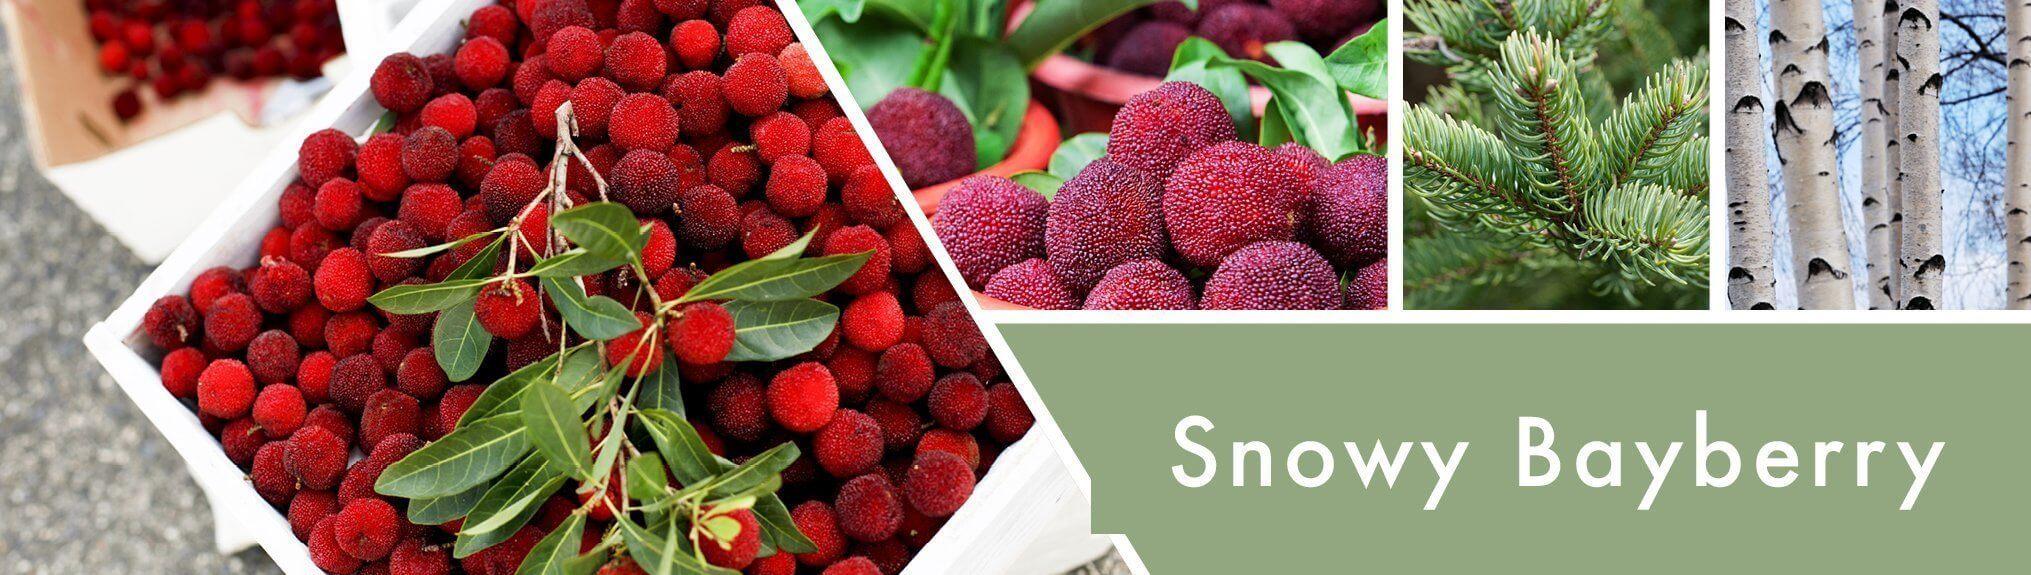 Snowy-Bayberry-Banner